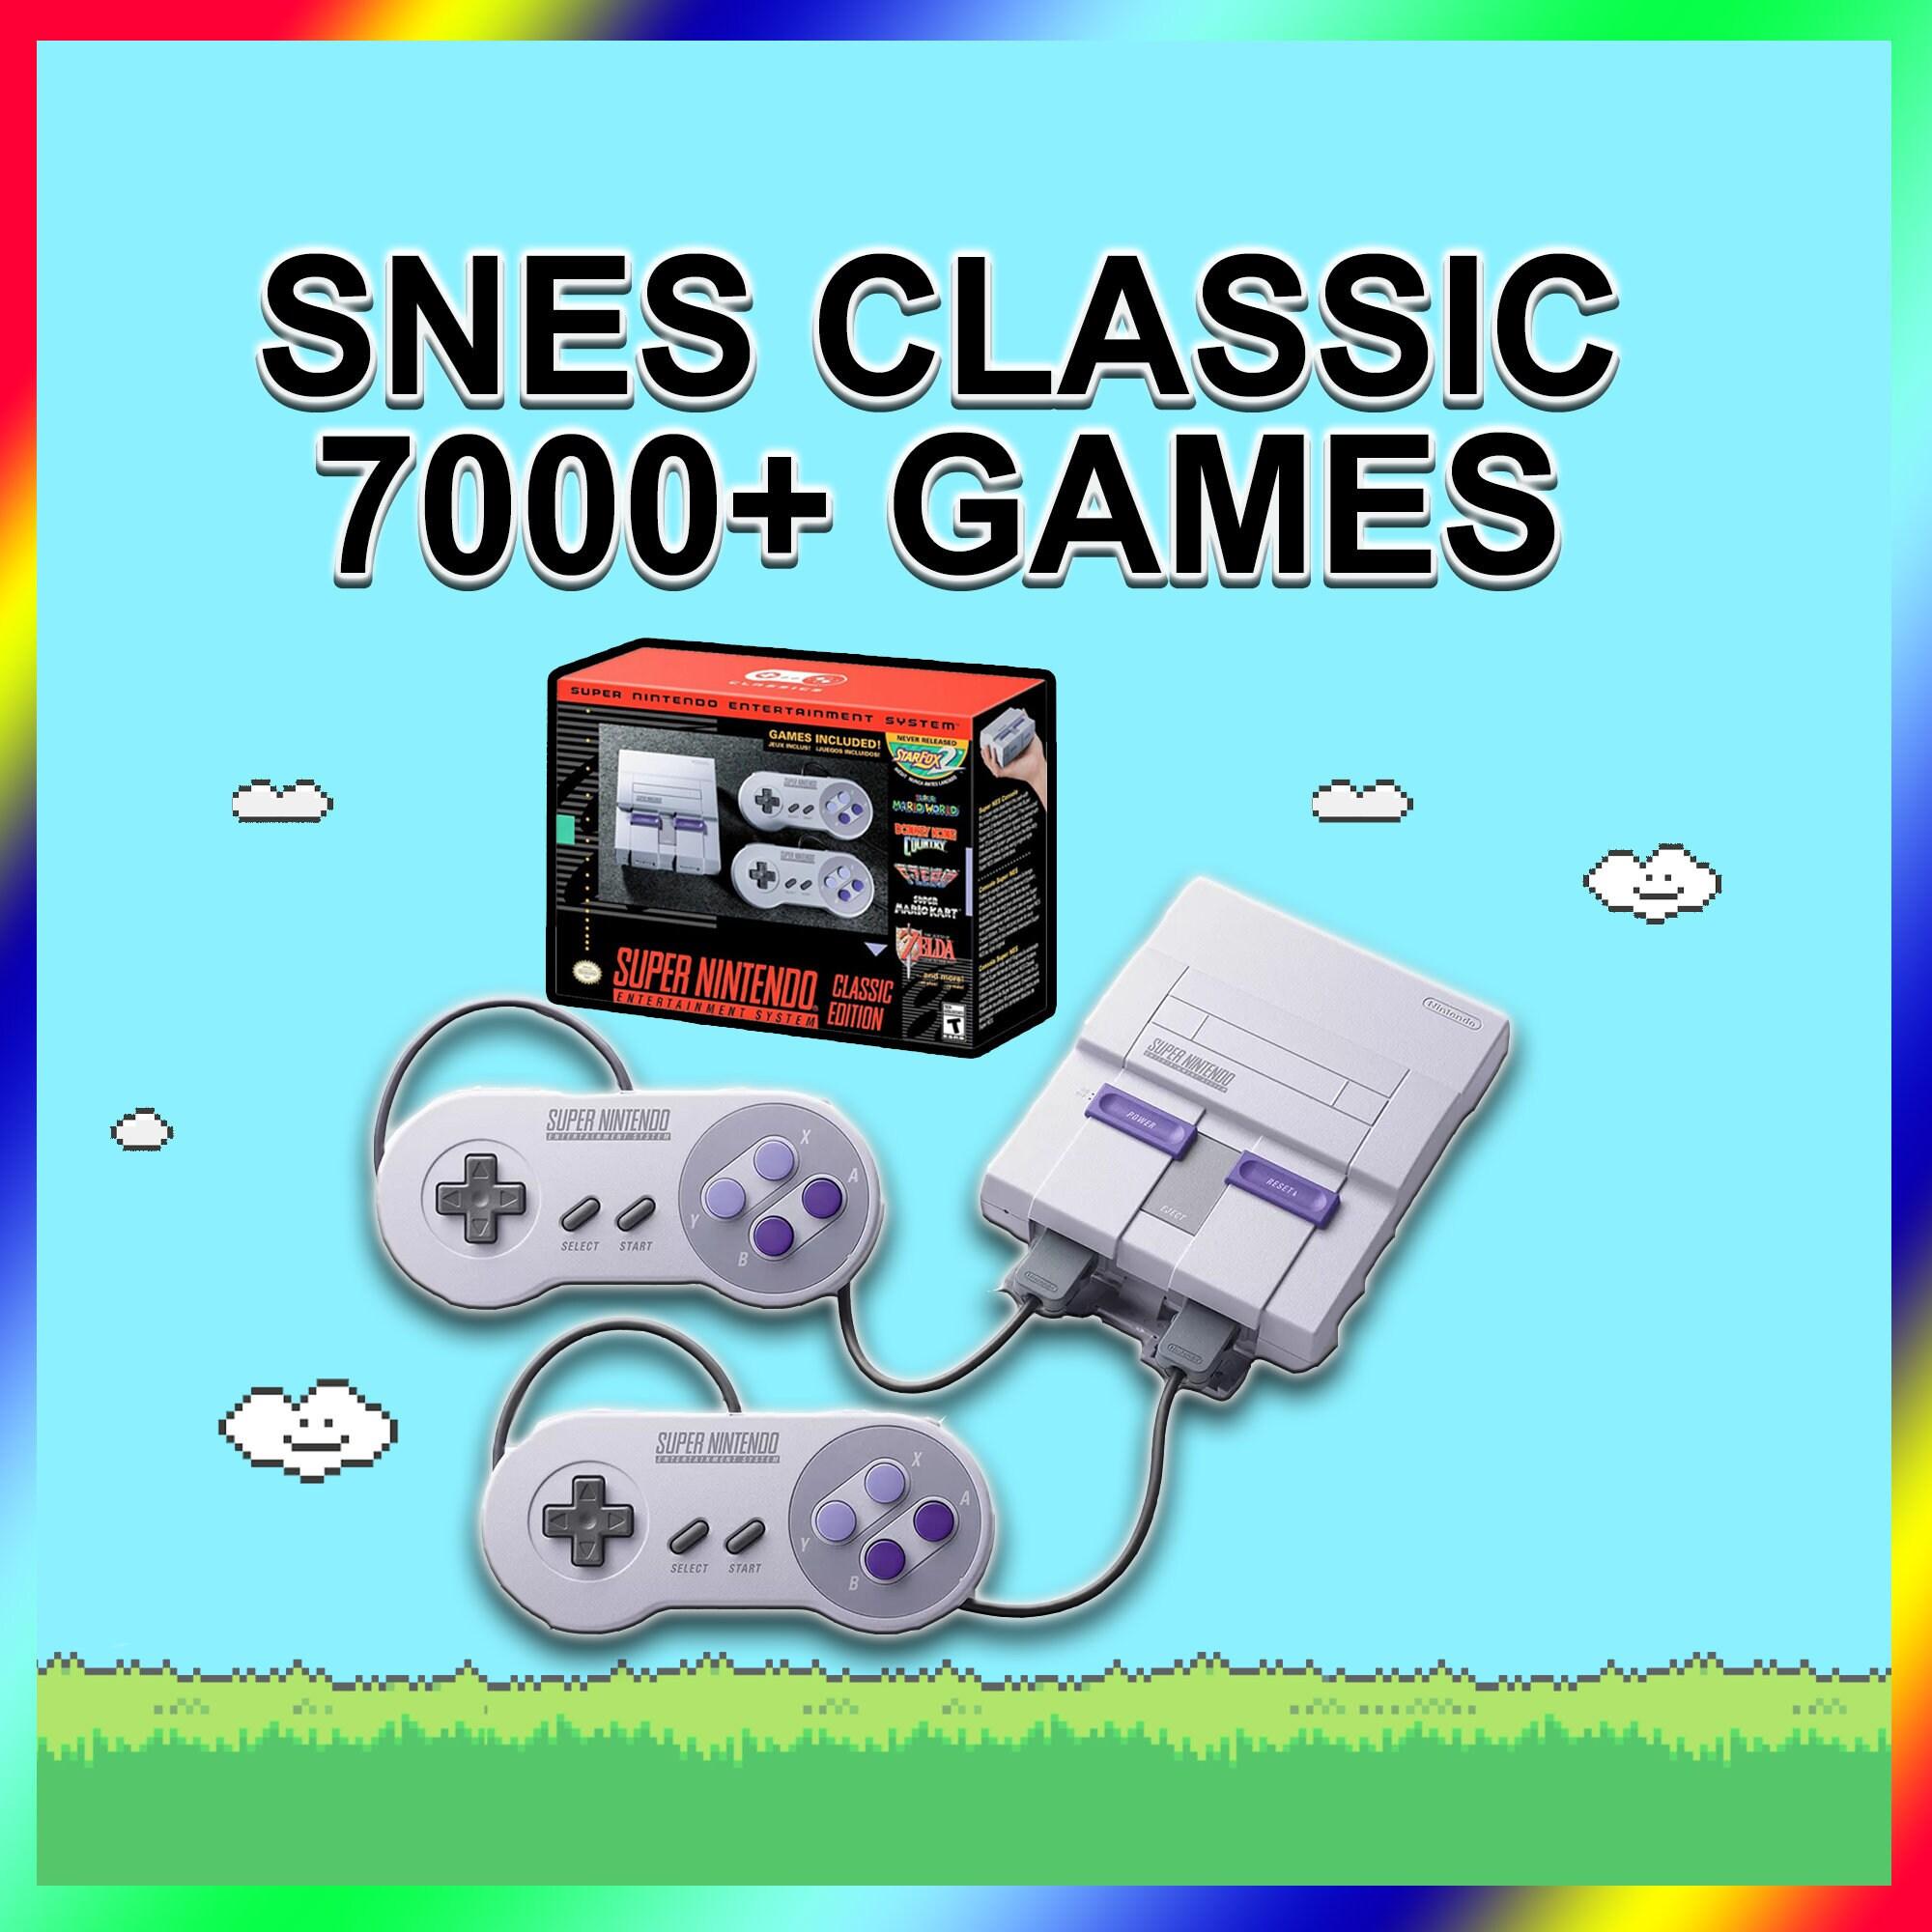 SNES Classic Modded 7000+ Games 15 Systems - Super Nintendo Classic Edition  Mini Retro Gaming System (Sega, Atari, Arcade, Game Boy, NES)